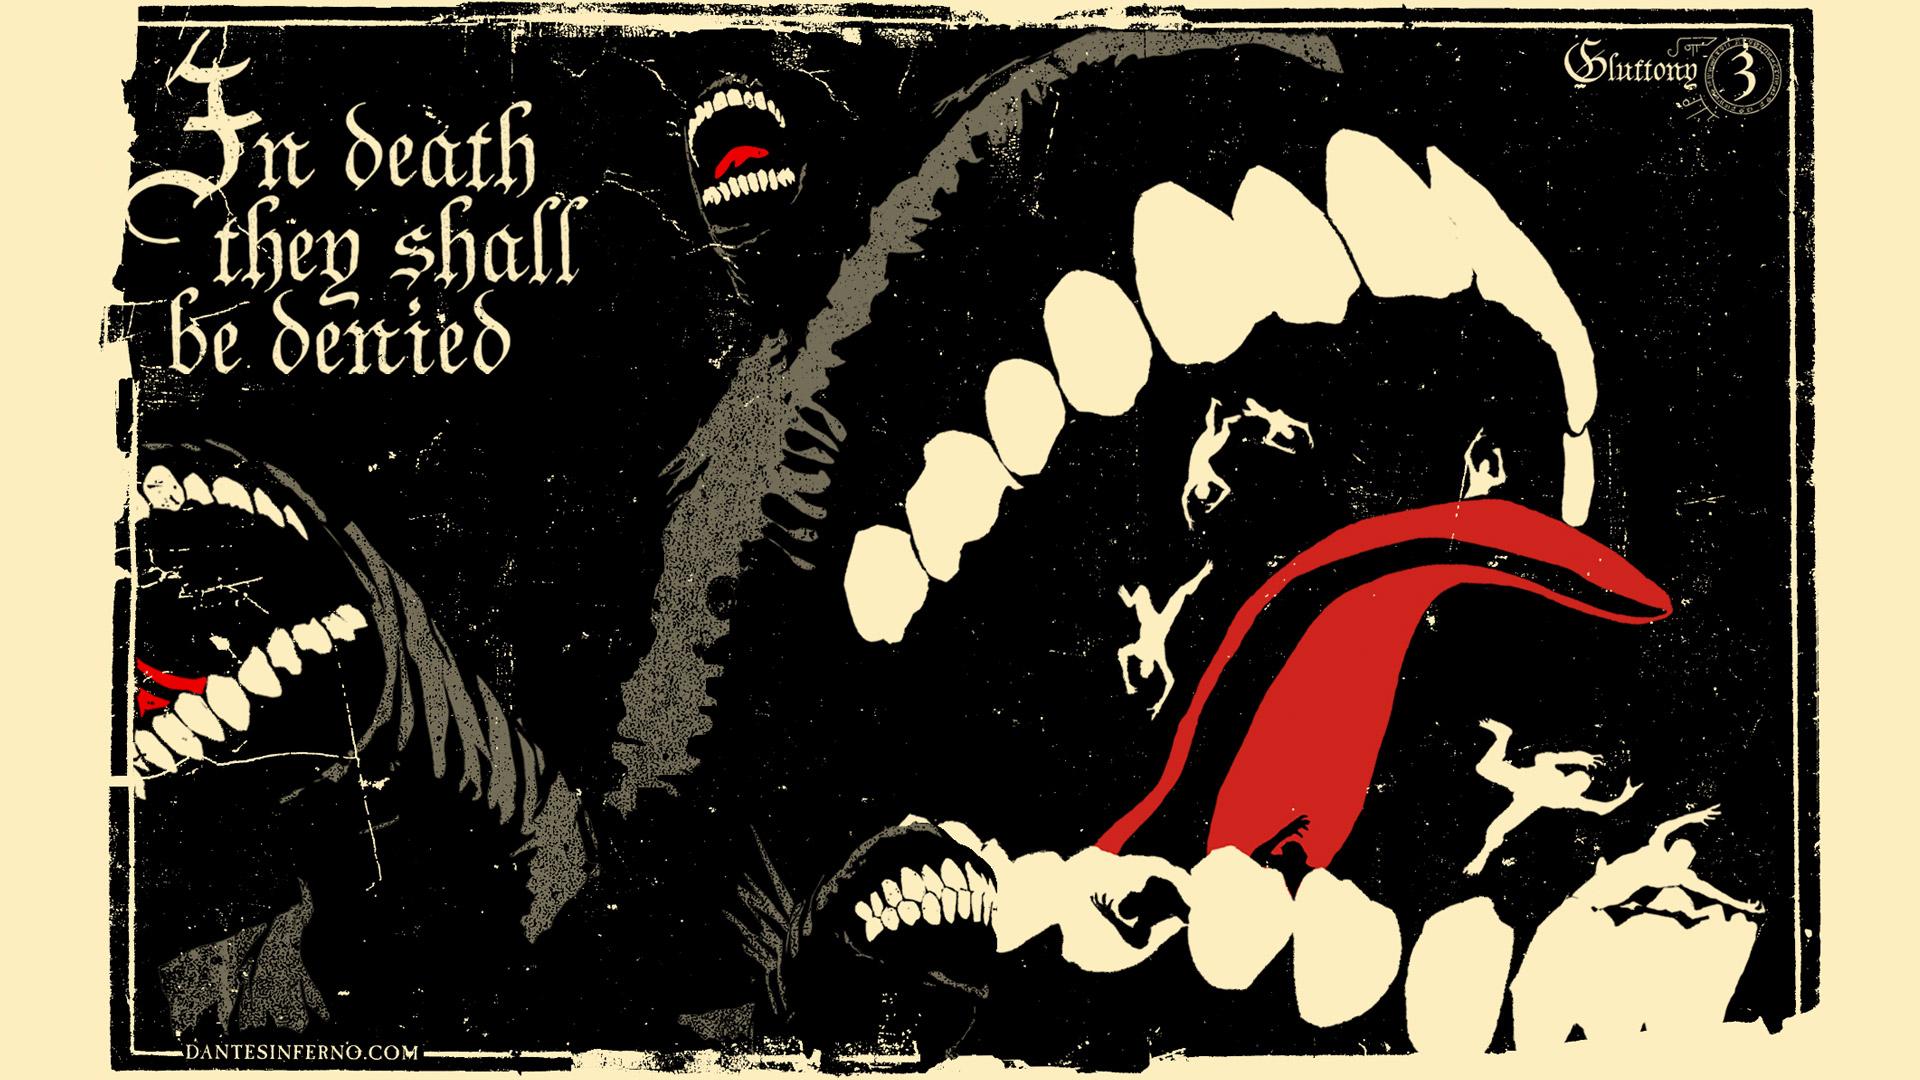 Dante's Inferno Wallpaper in 1920x1080